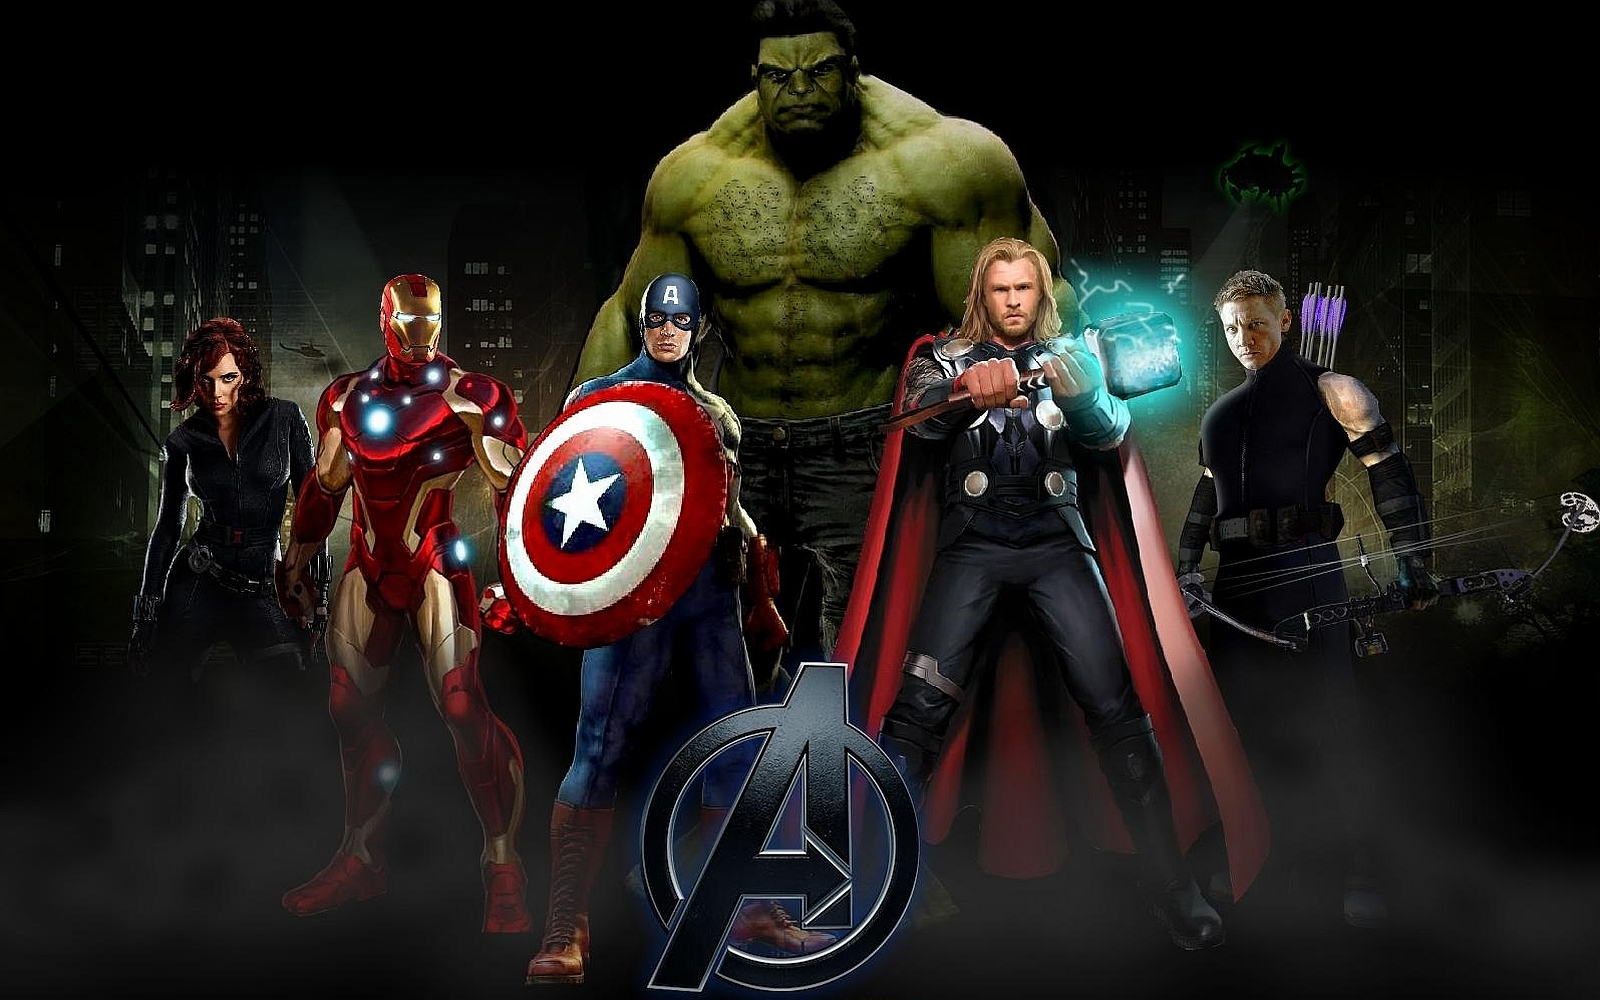 The Avengers Computer Wallpapers Desktop Backgrounds 1600x1000